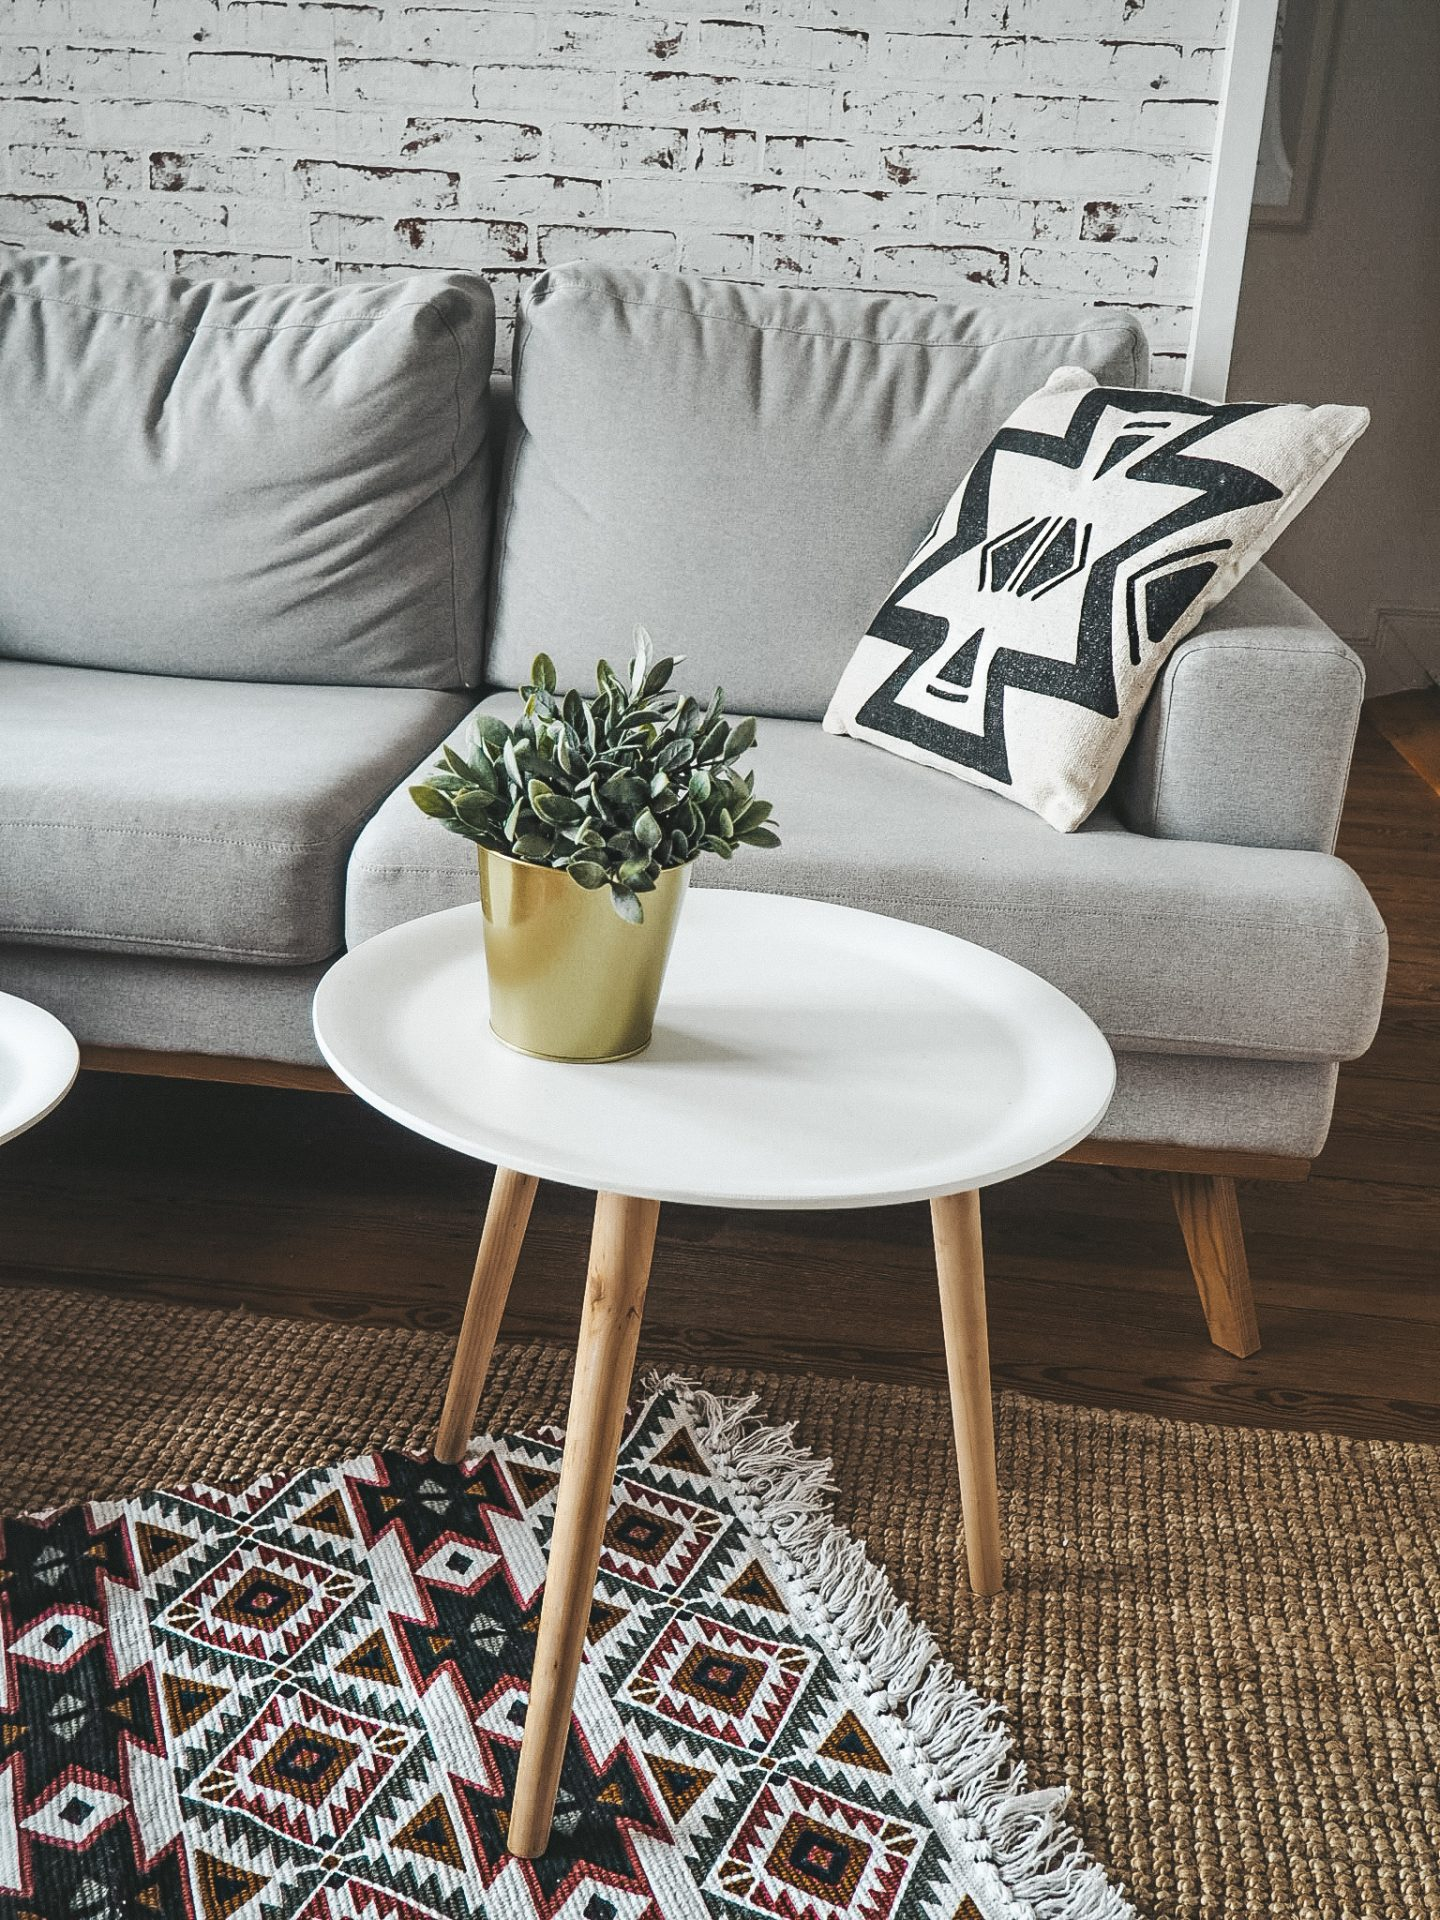 zeeman-home-Wohnzimmer-bohemian